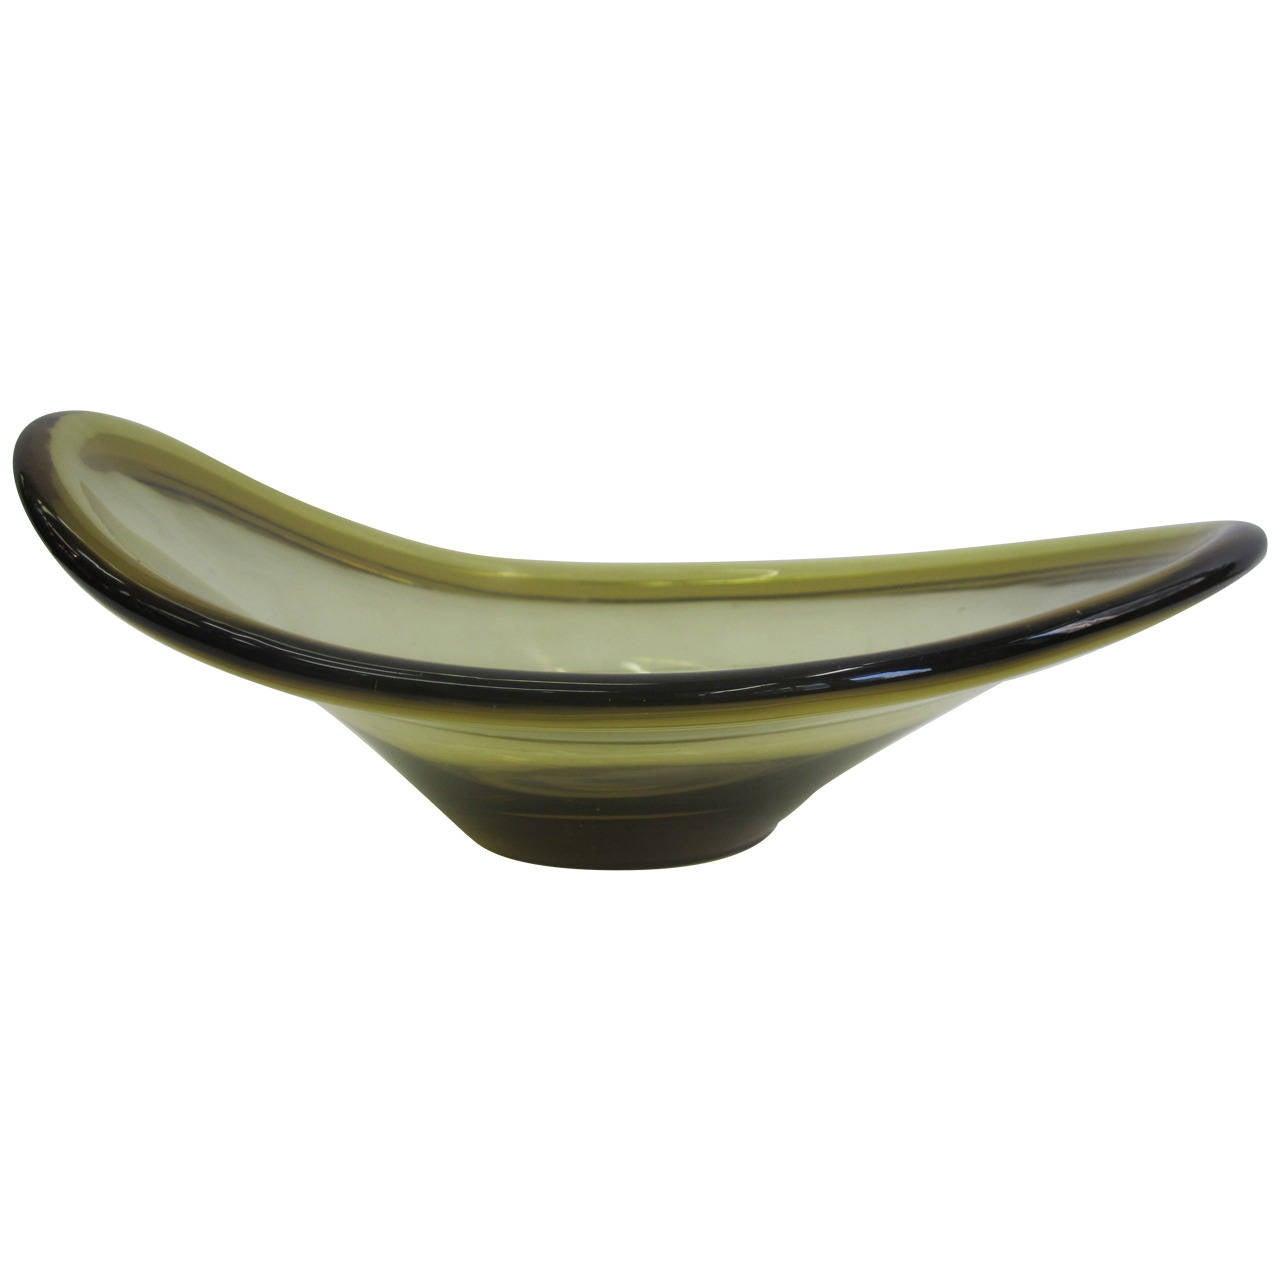 Mid Century Danish Modern Art Glass Bowl In Golden Yellow